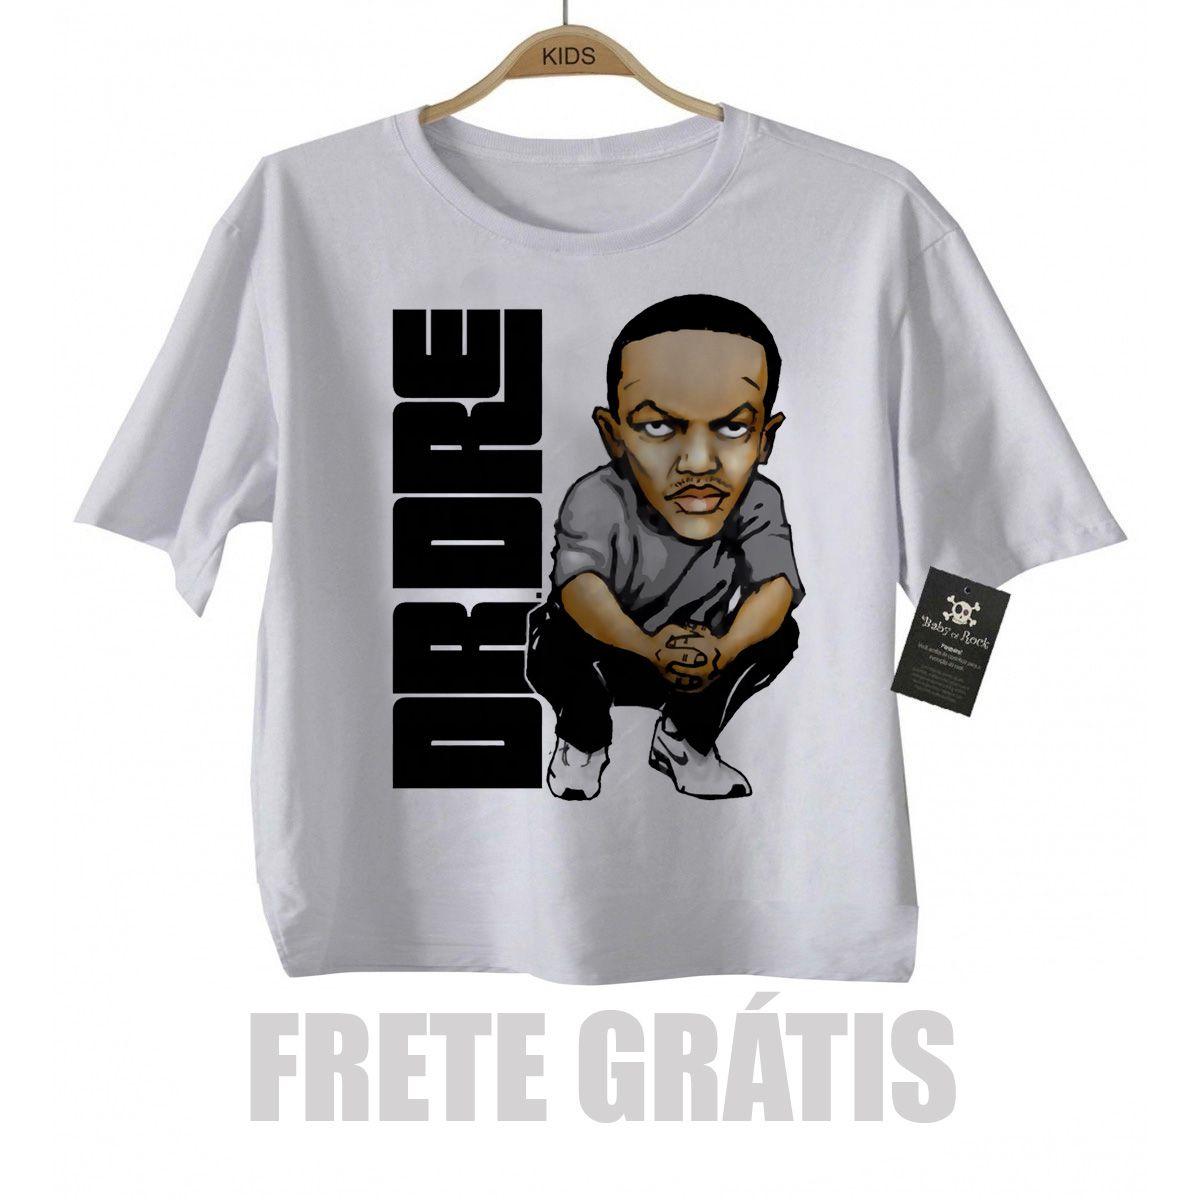 Camiseta Infantil  Rap / Hip hop  Baby Dr Dree  - White  - Baby Monster - Body Bebe